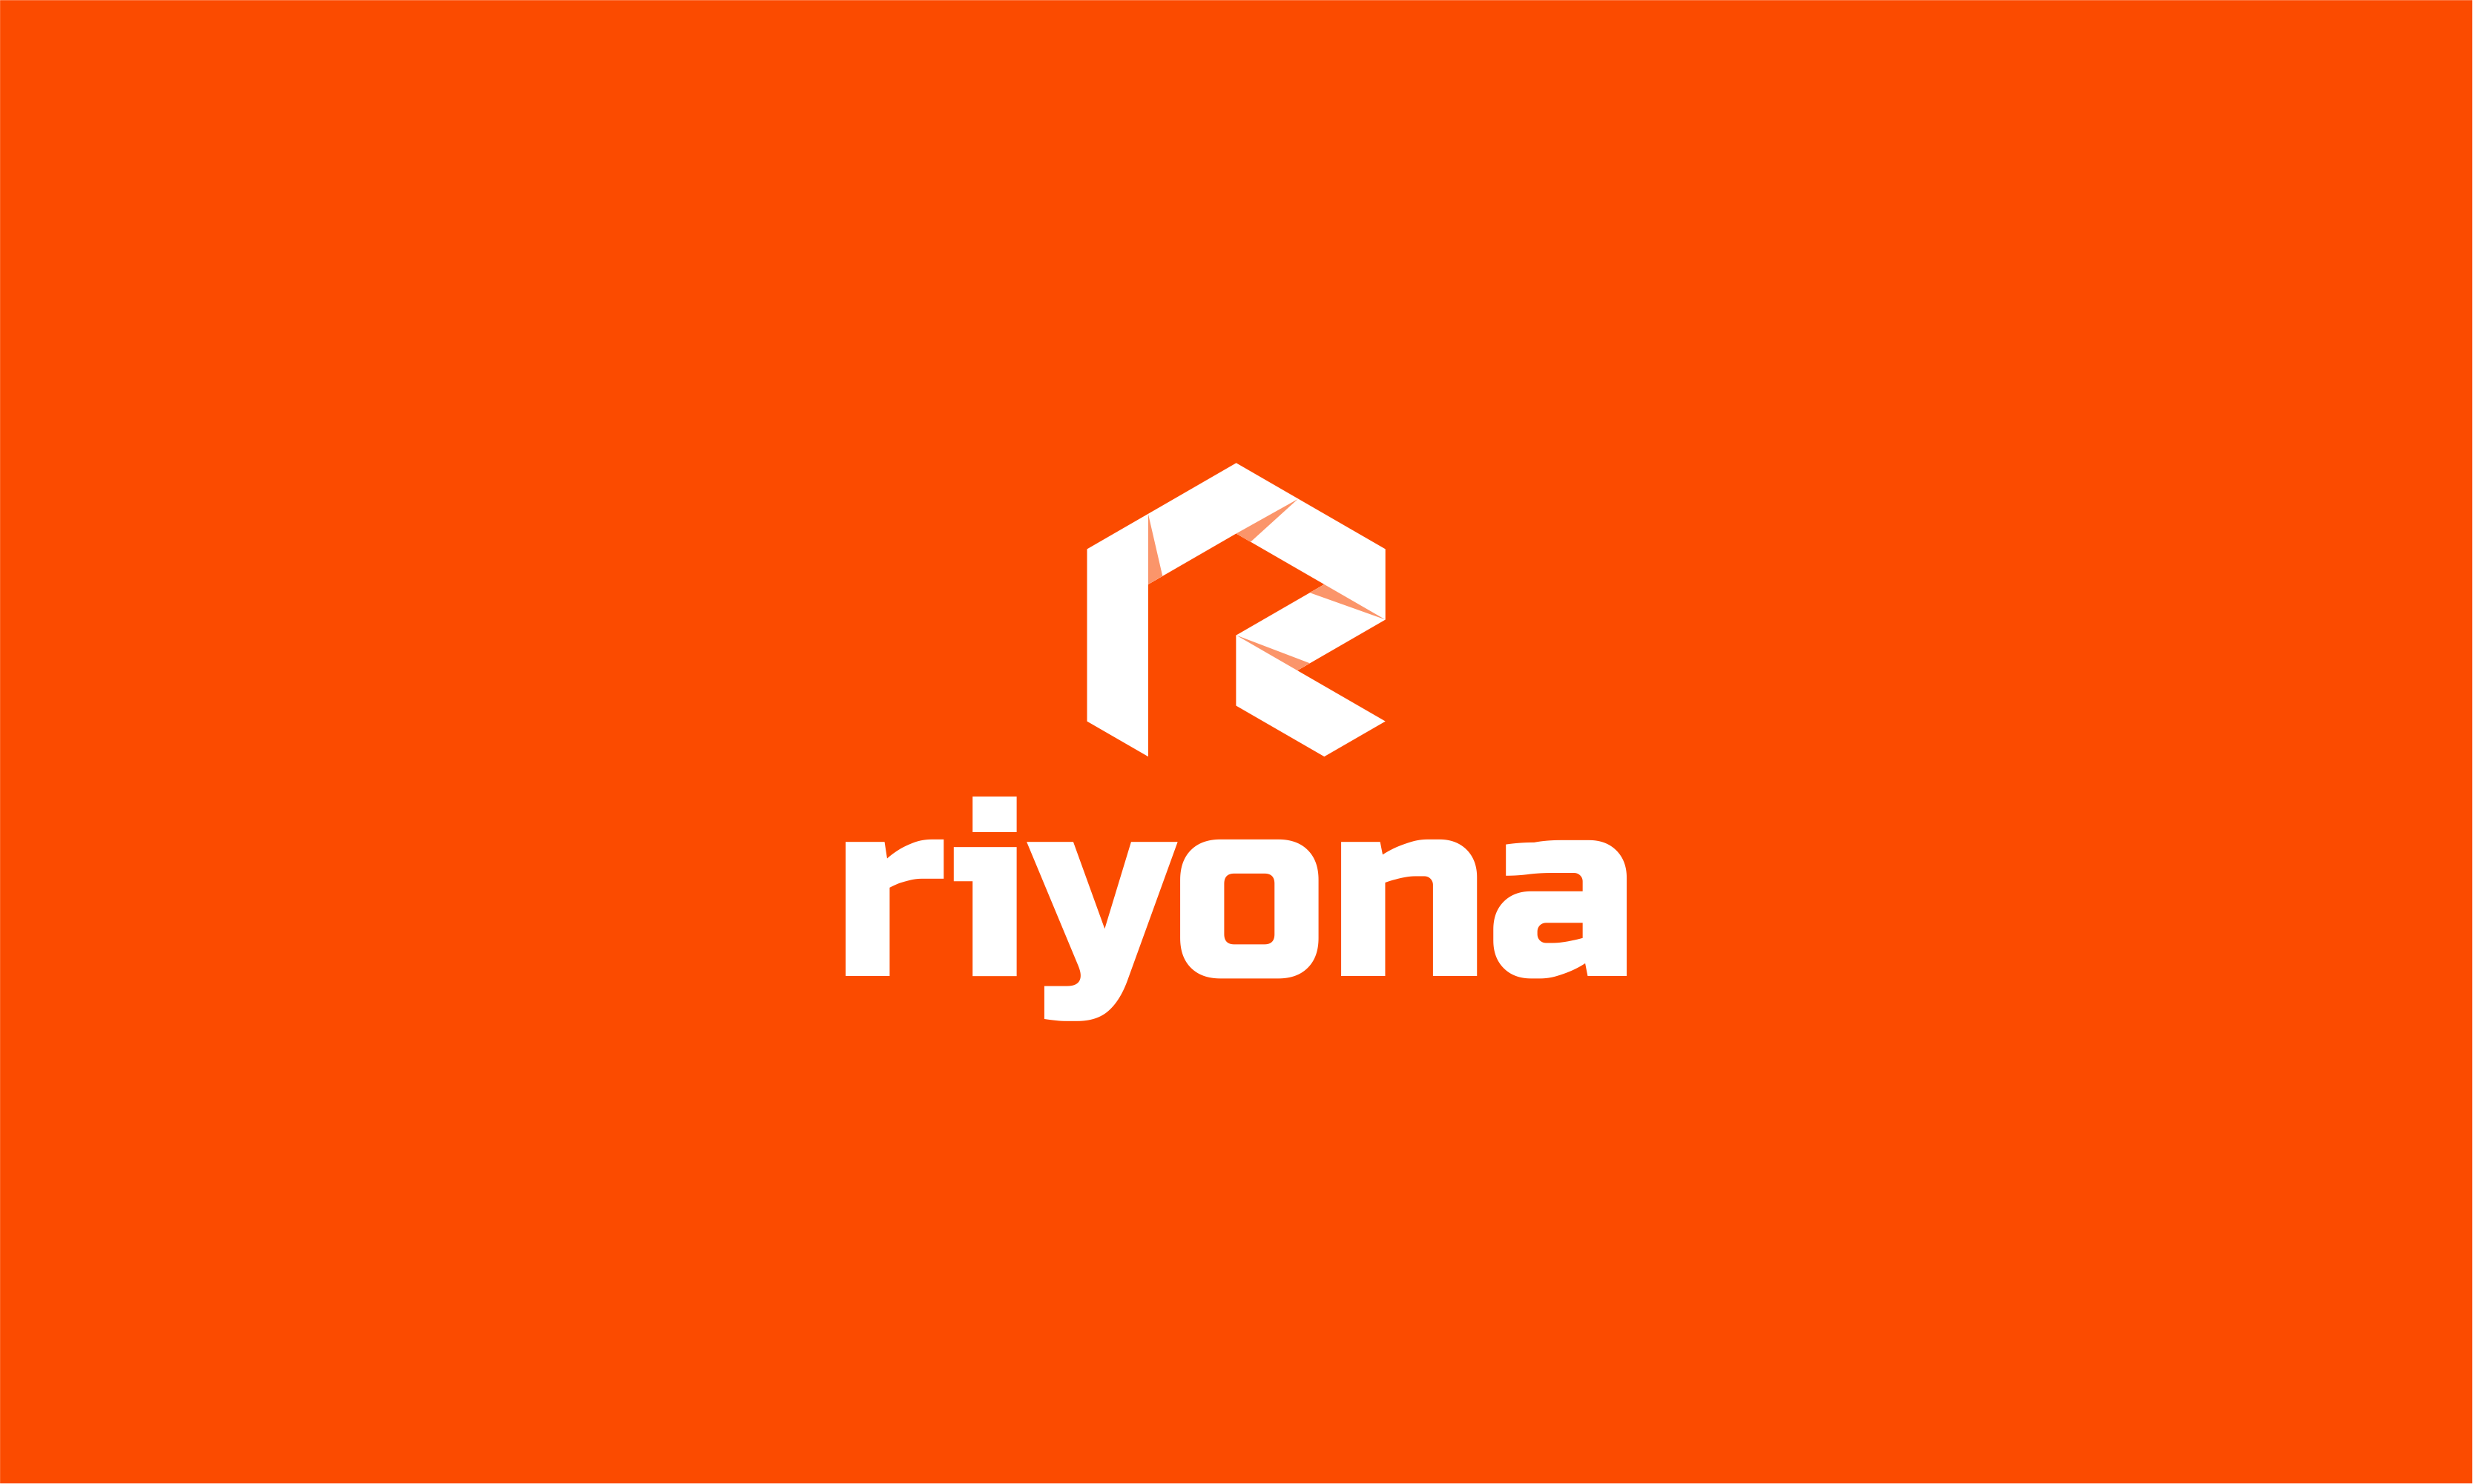 Riyona - Modern domain name for sale